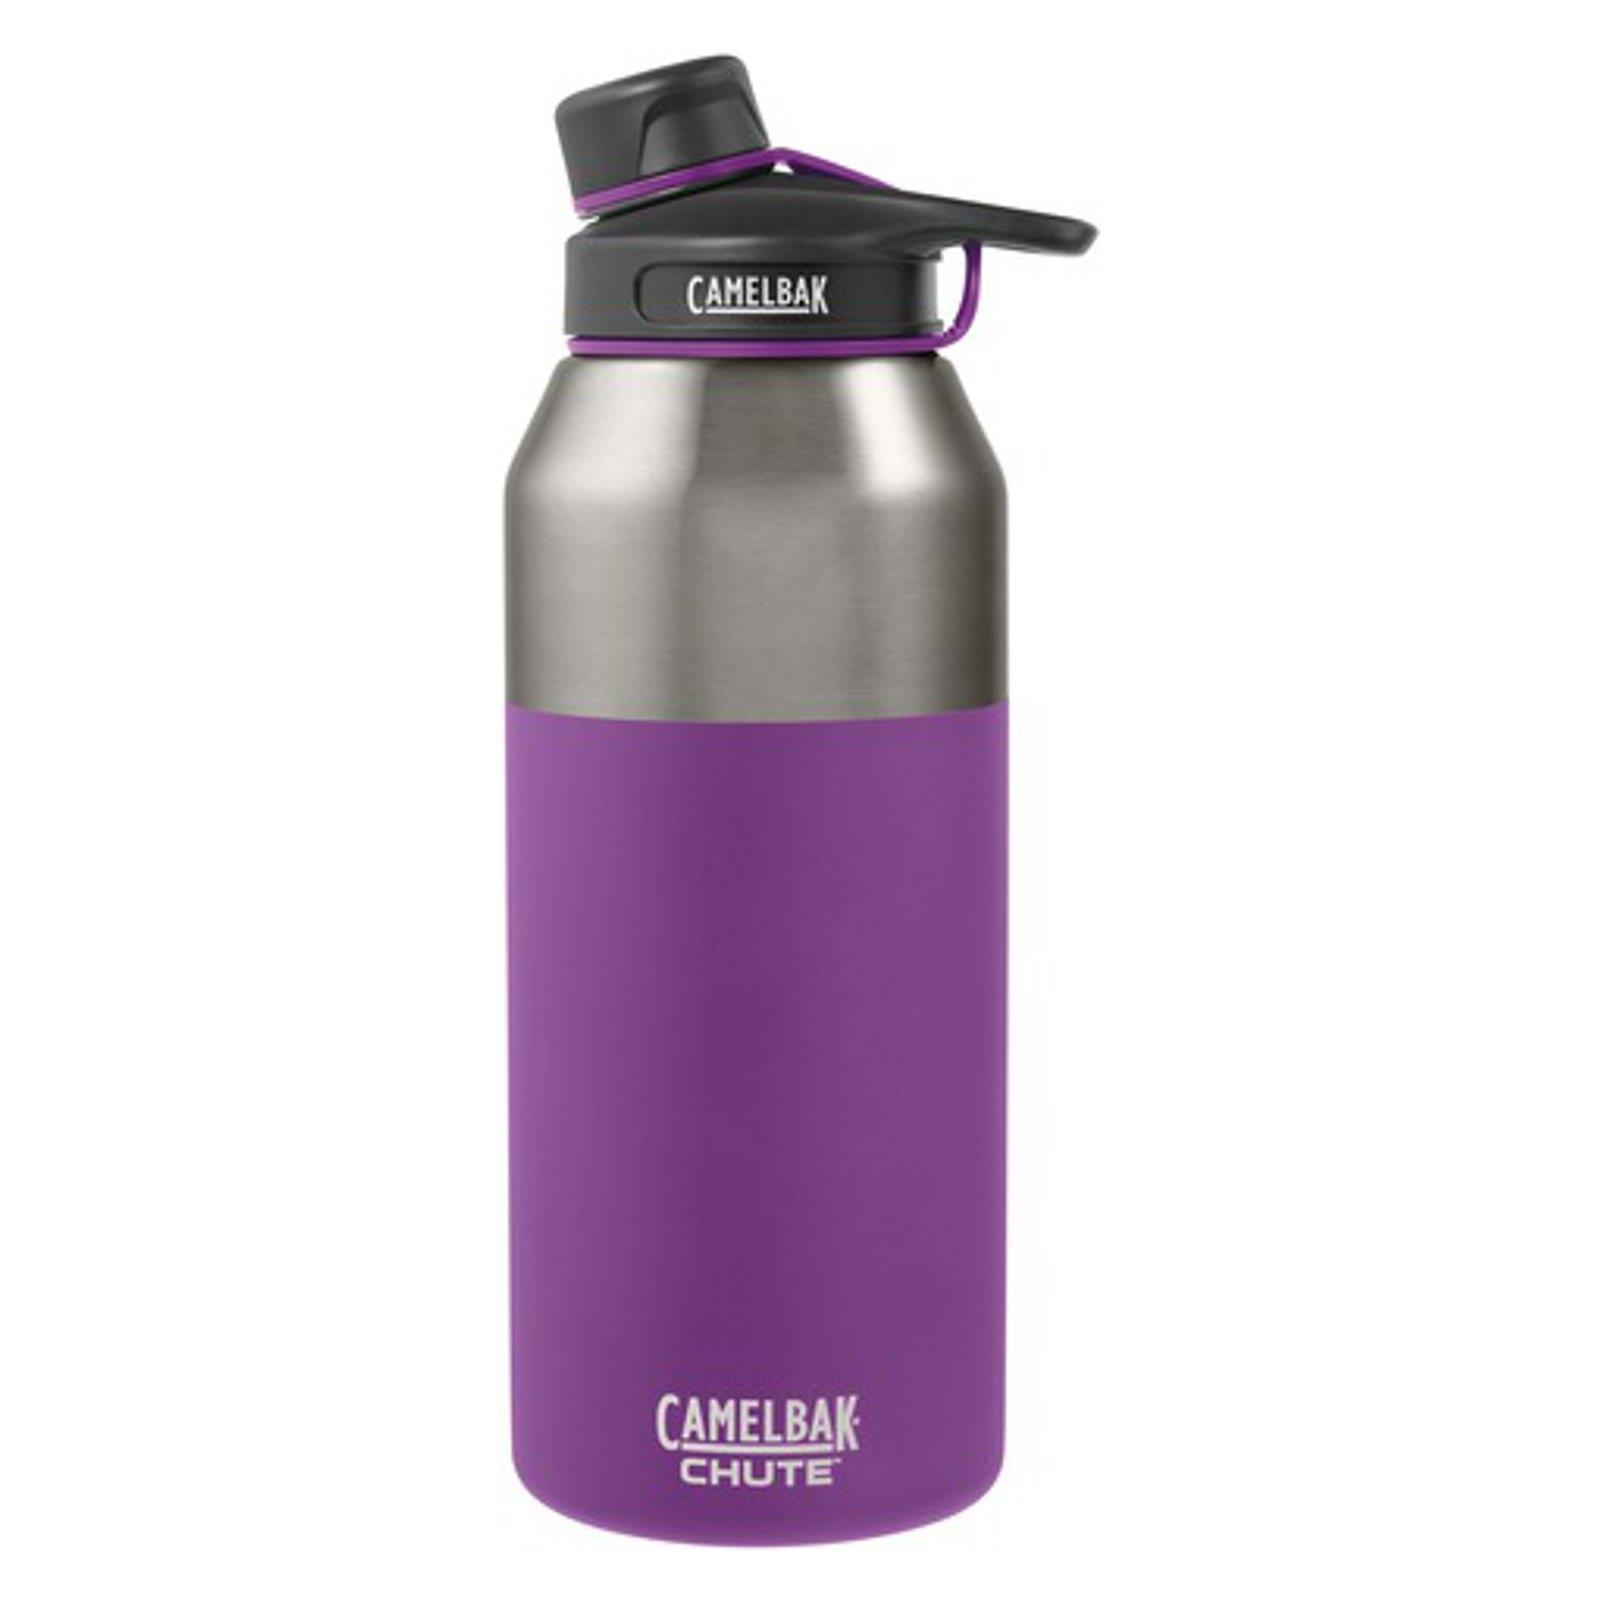 Camelbak-Trink-Isolier-Flasche-Chute-Vacuum-Thermo-Becher-Kanne-Outdoor Indexbild 19